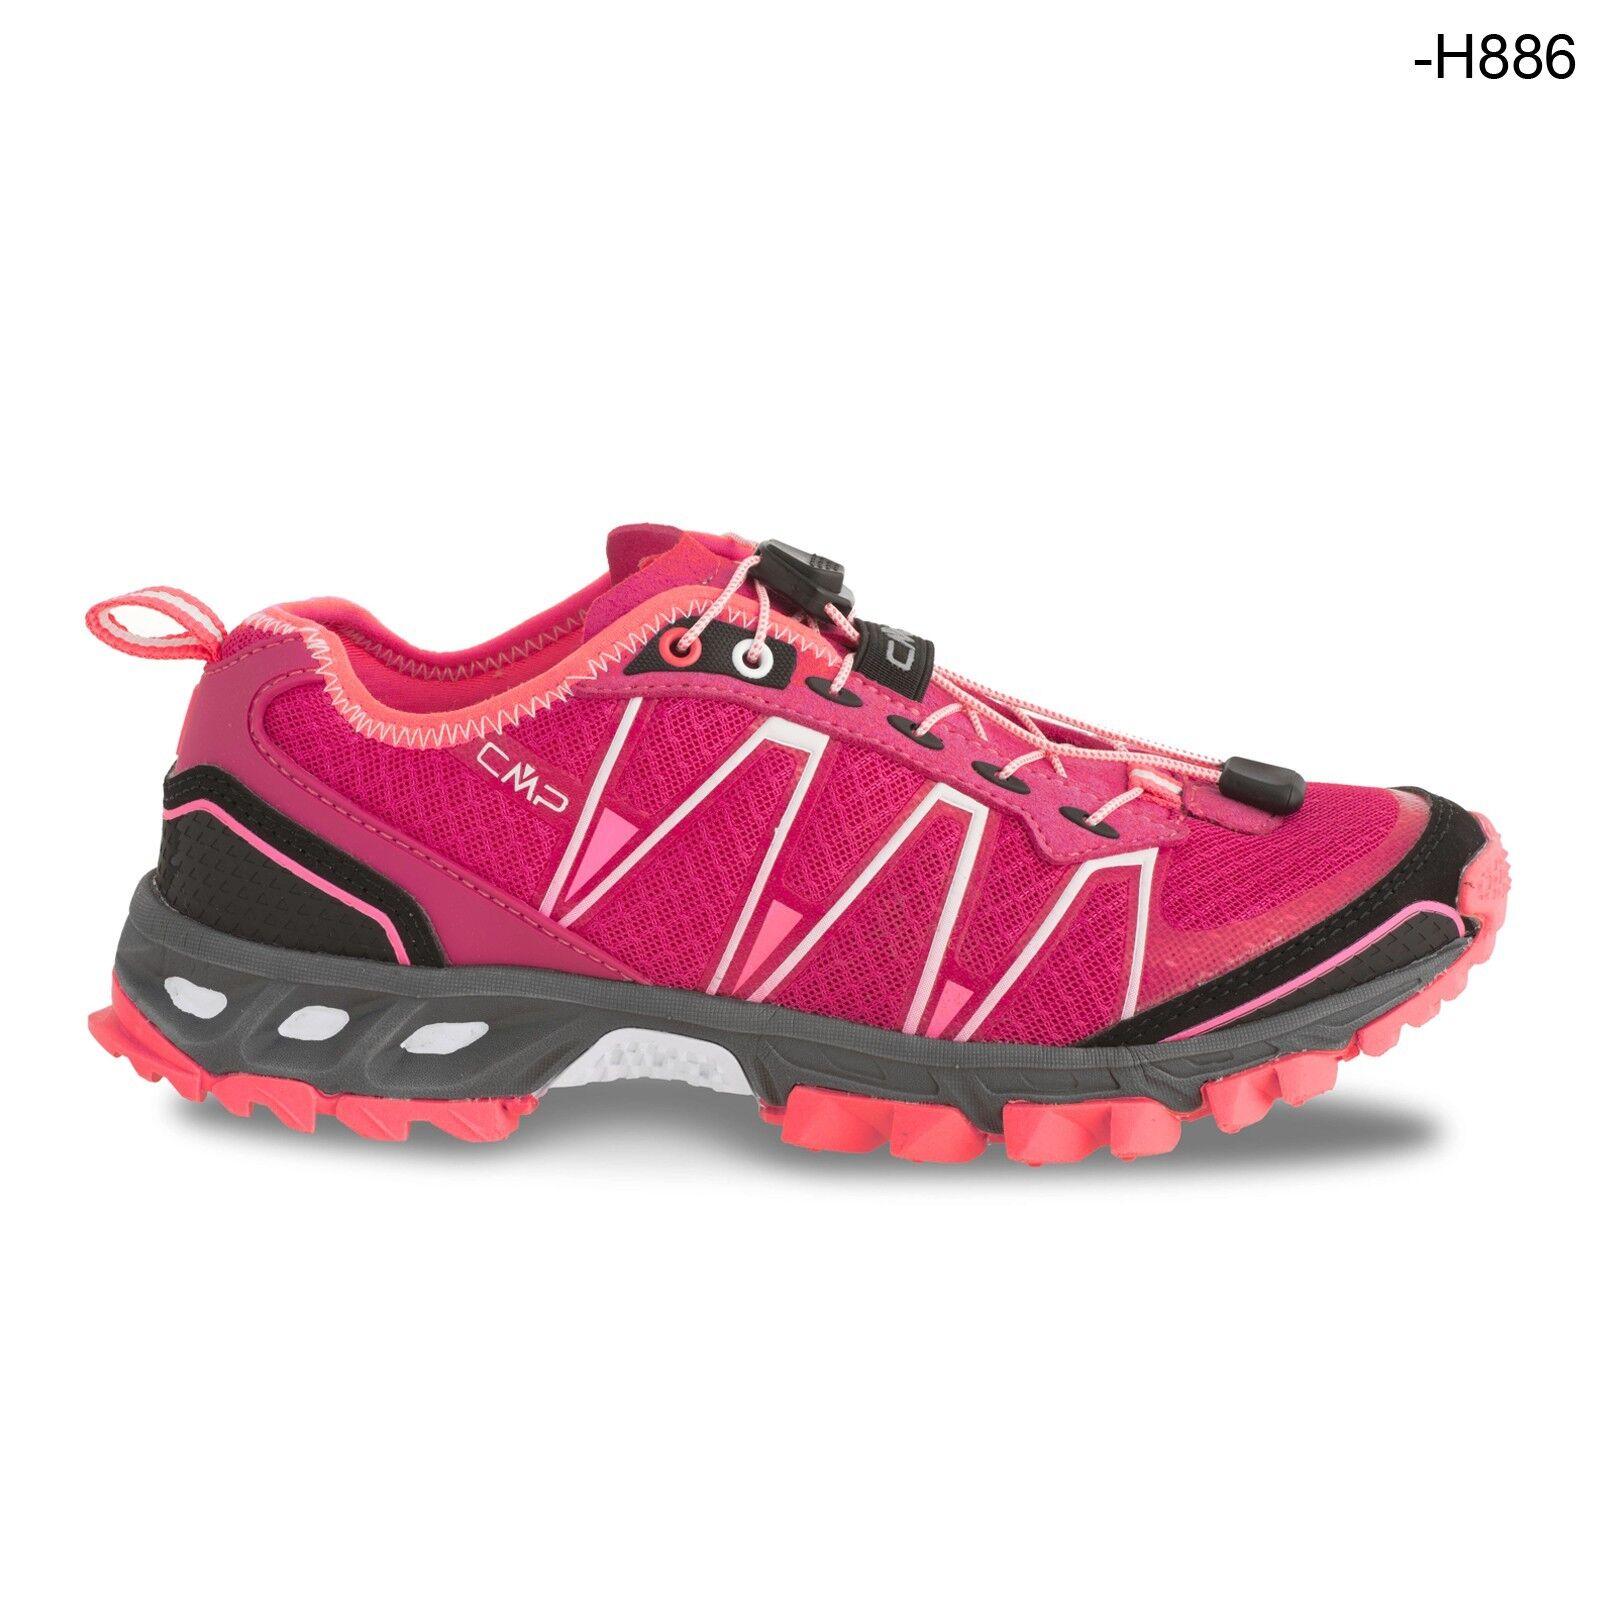 CMP Damen Trail Running Schuhe Laufschuhe Altak Farbwahl Farbwahl Farbwahl b744fb